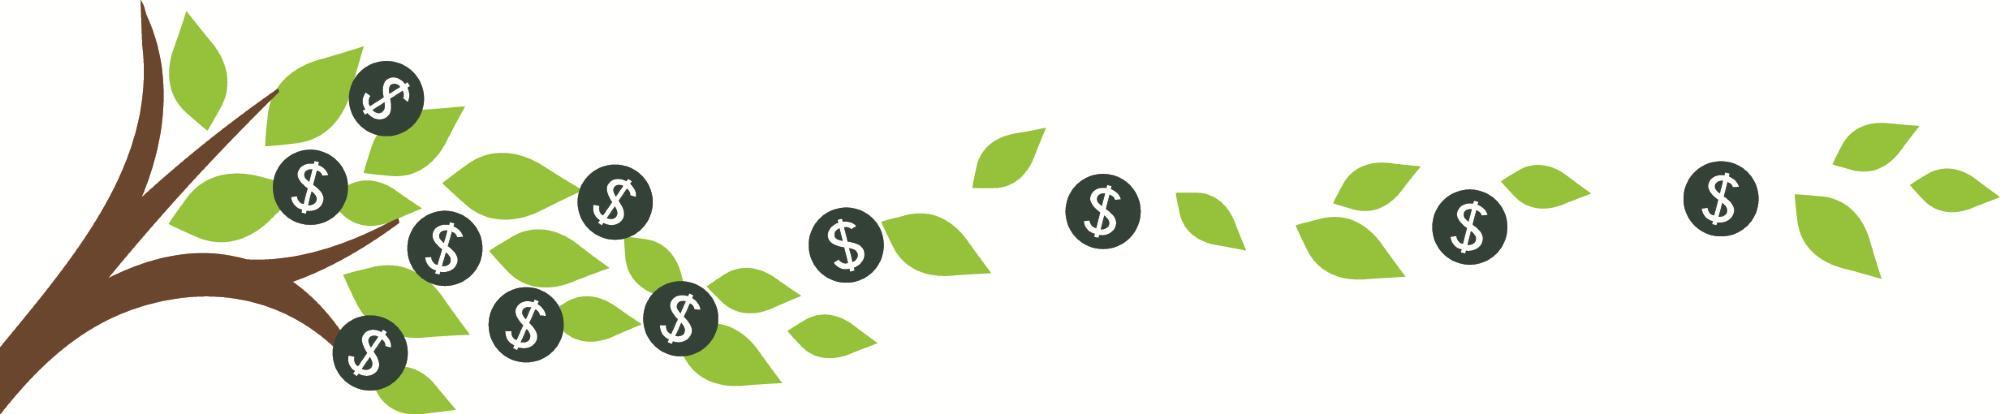 Green tree losing money leaves.